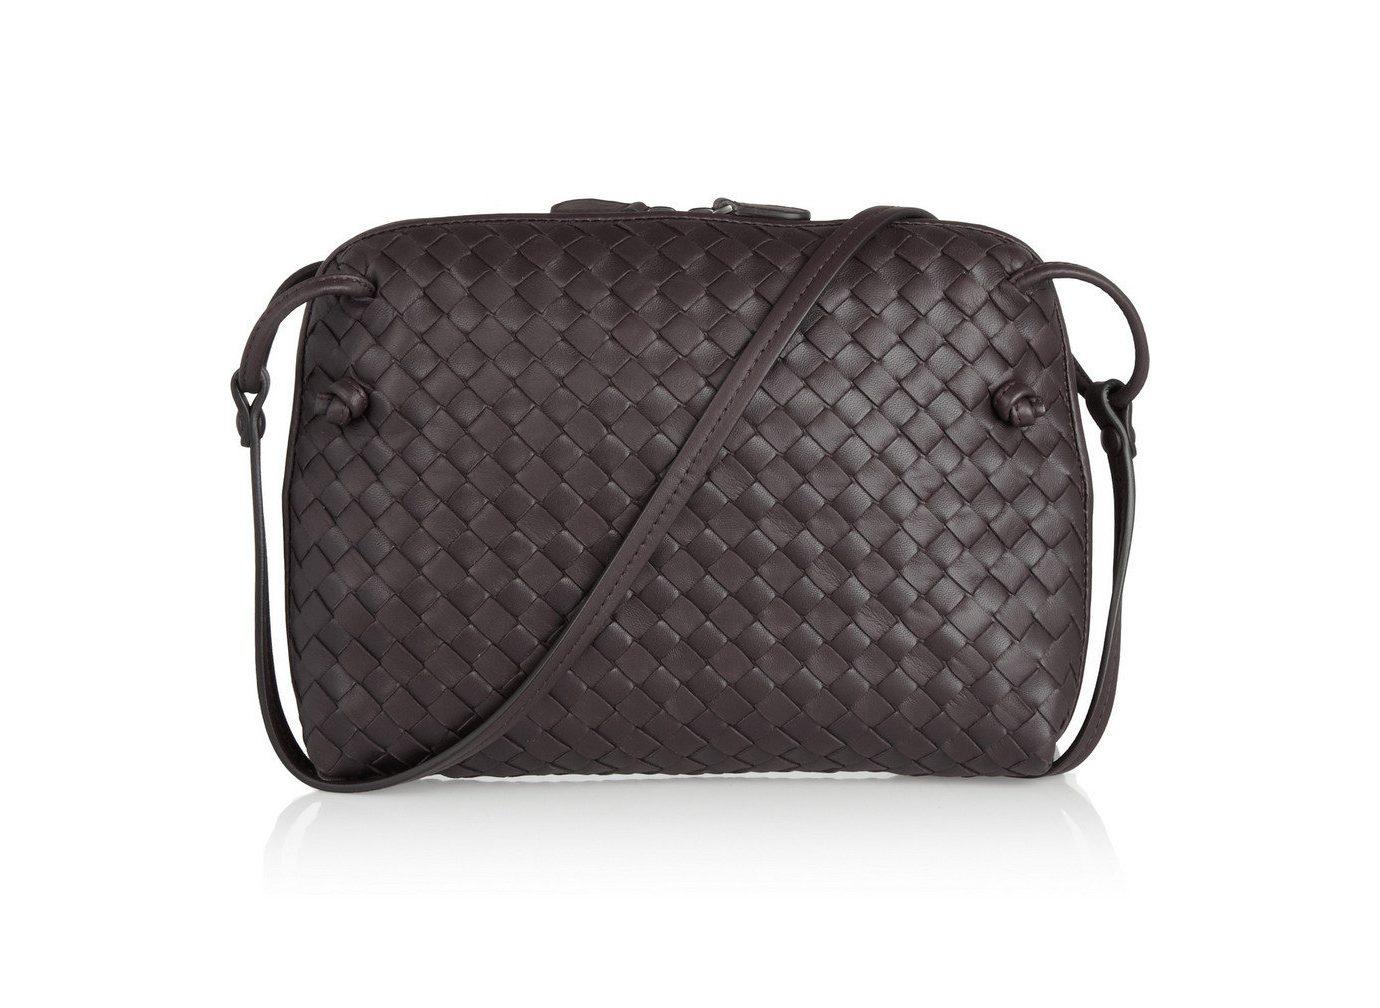 Style + Design Travel Shop bag black accessory messenger bag case shoulder bag fashion accessory handbag product leather pattern product design hand luggage brand